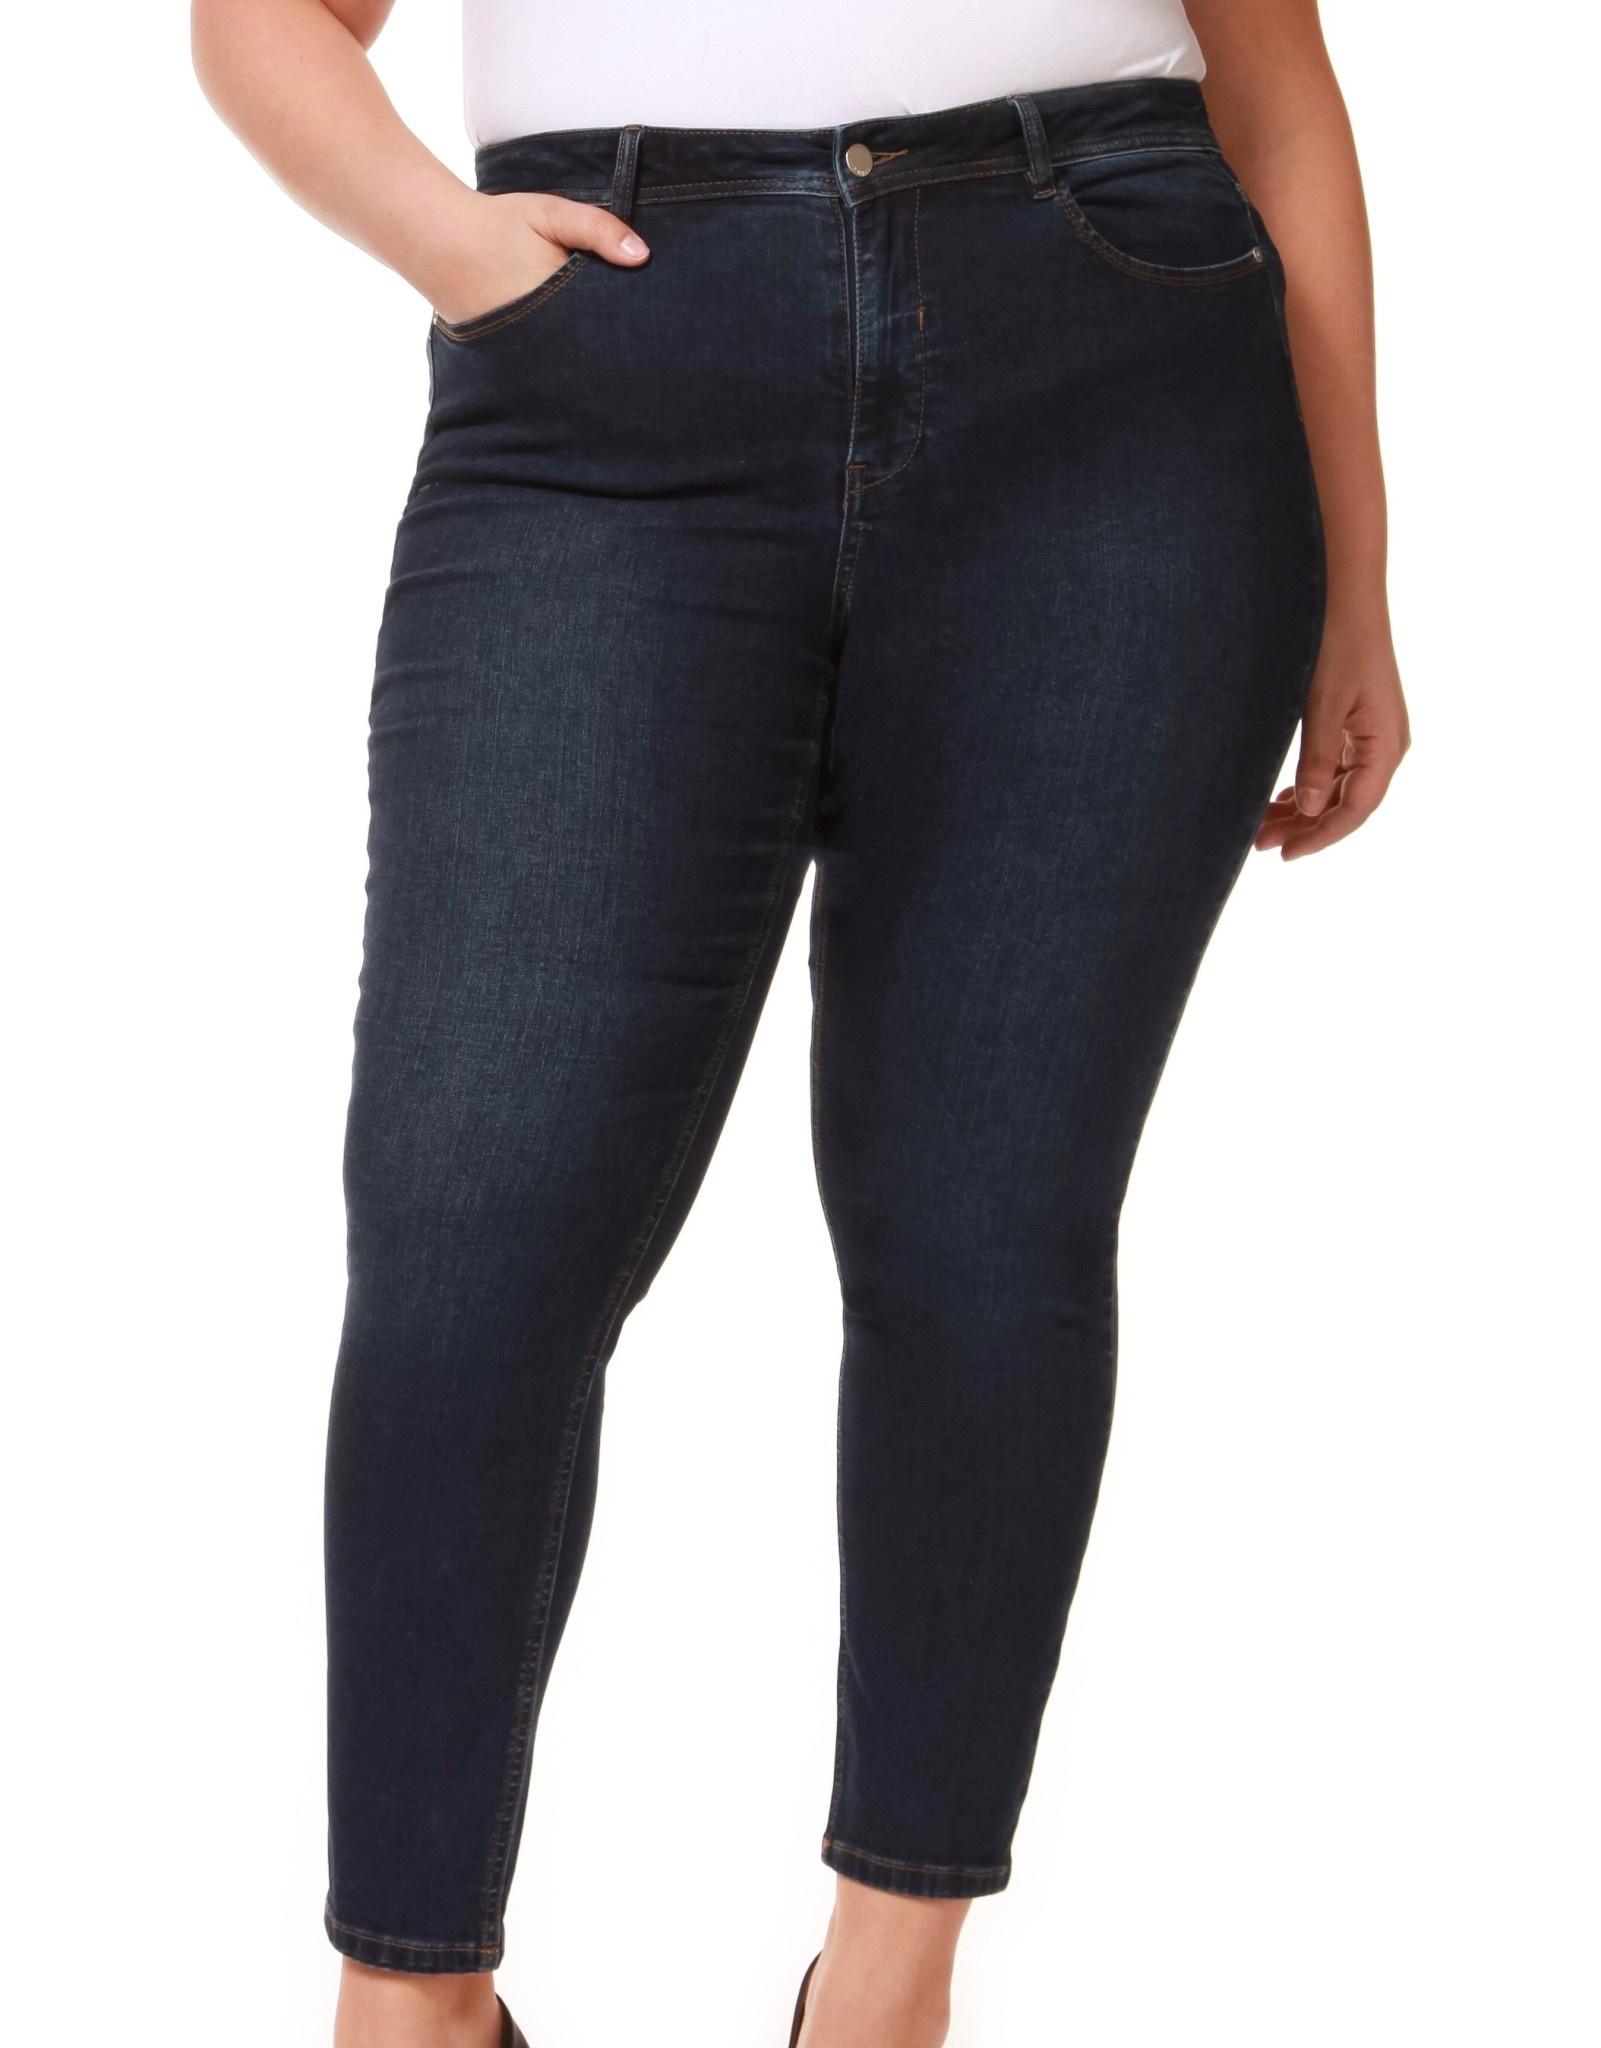 Dex Mid Rise Ankle Skinny Jean